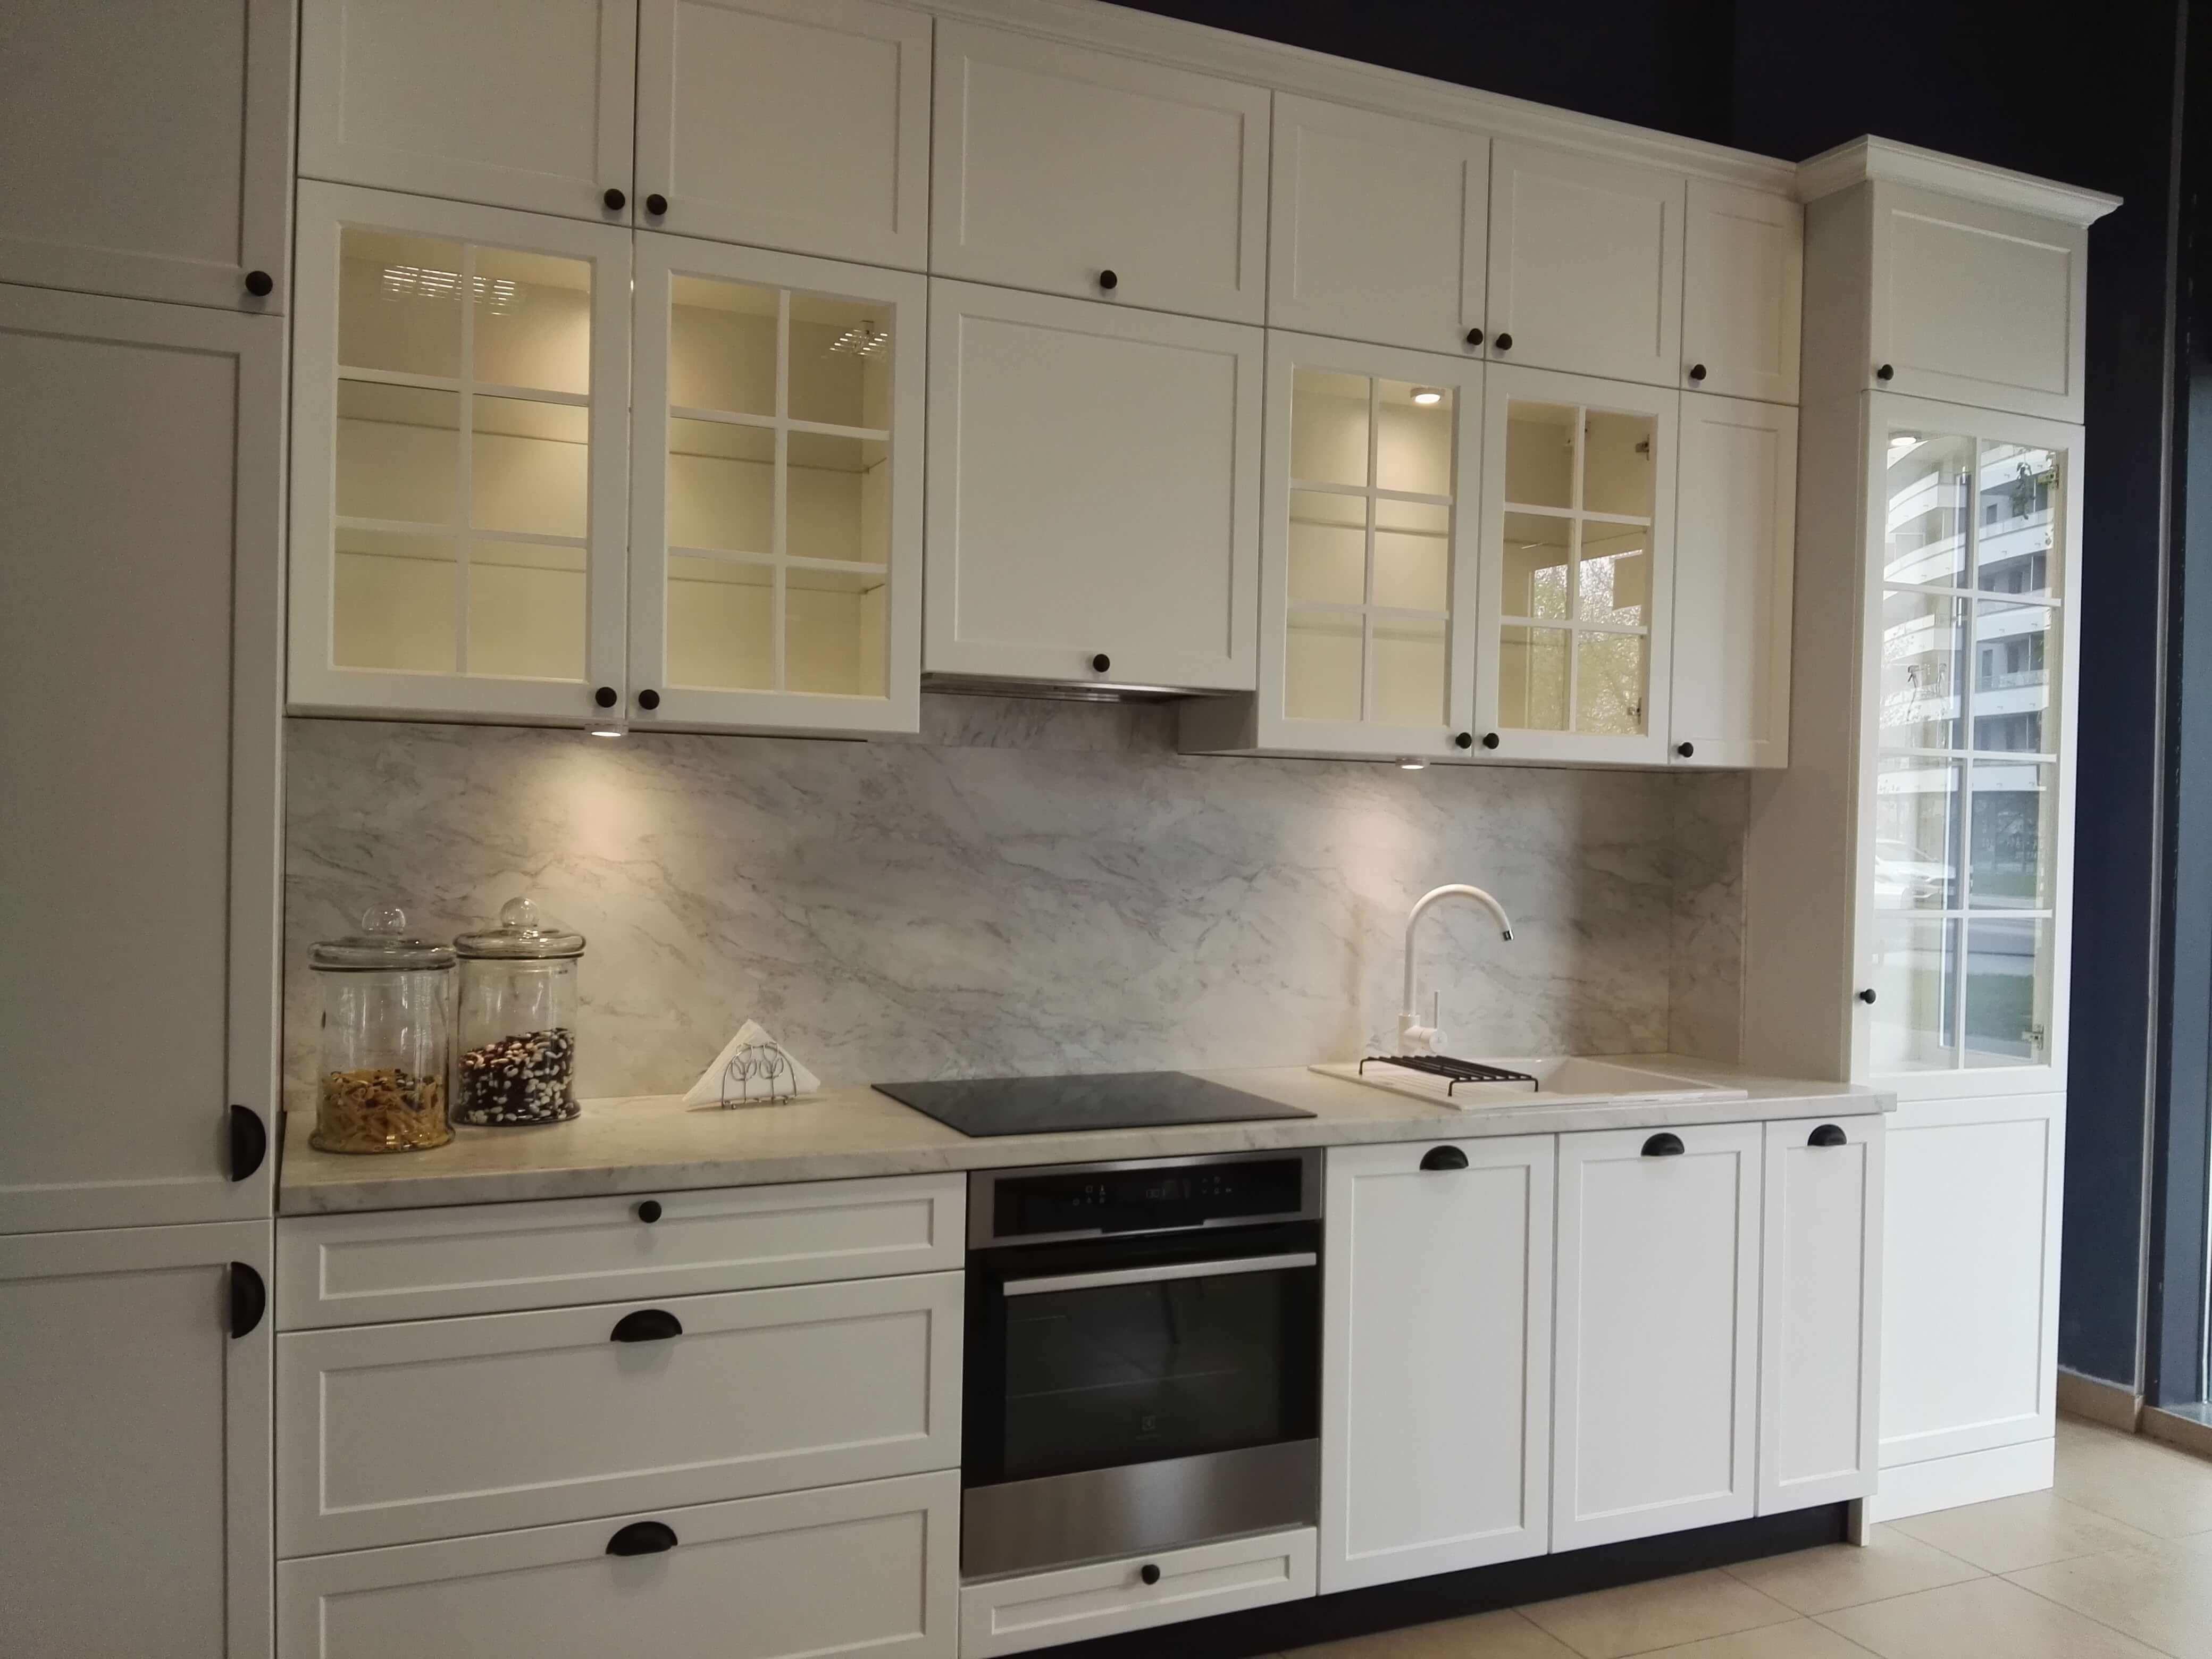 Meble Kuchenne Realizacje Meble Na Wymiar I Fronty Meblowe Warszawa Kitchen Kitchen Cabinets Home